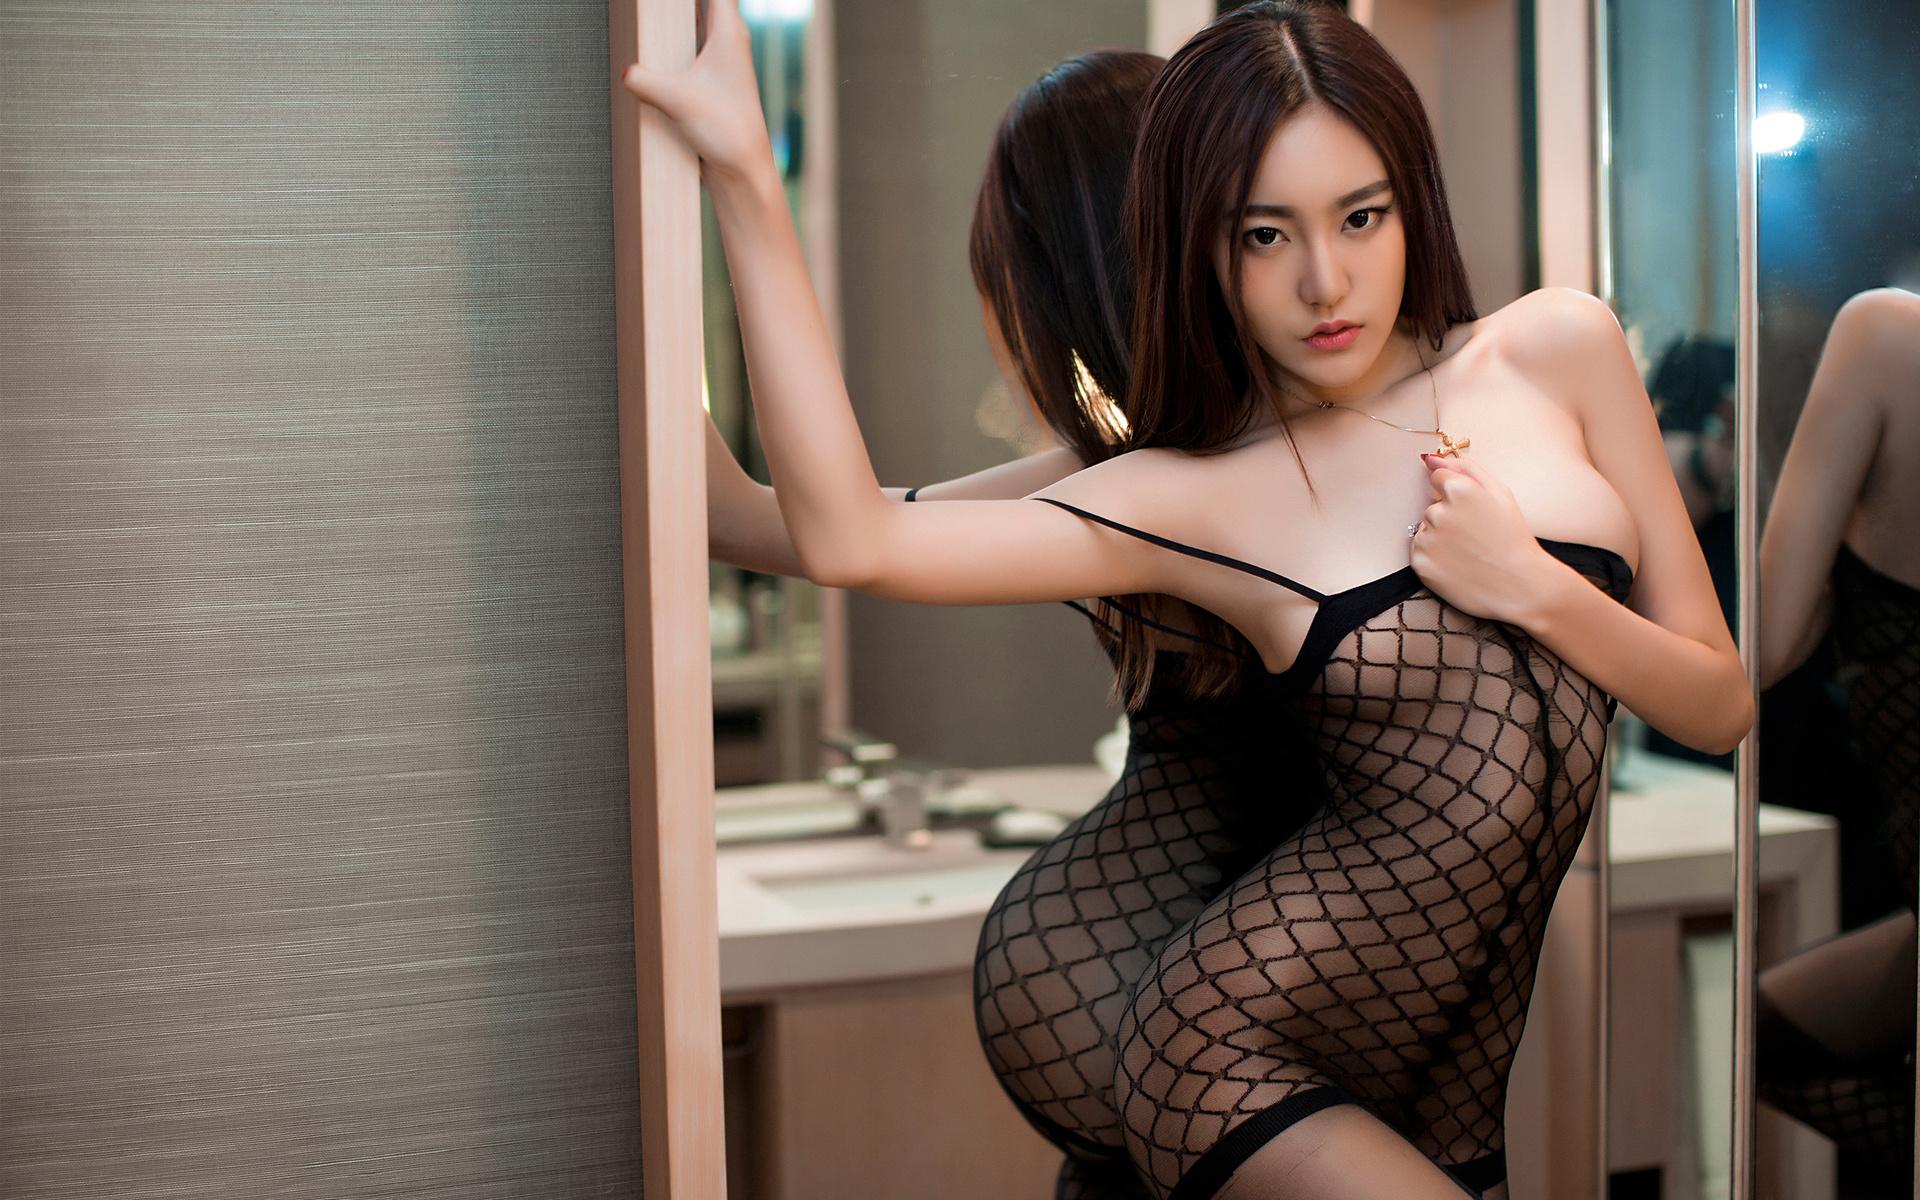 Anal asian nude vinyl bra porn star